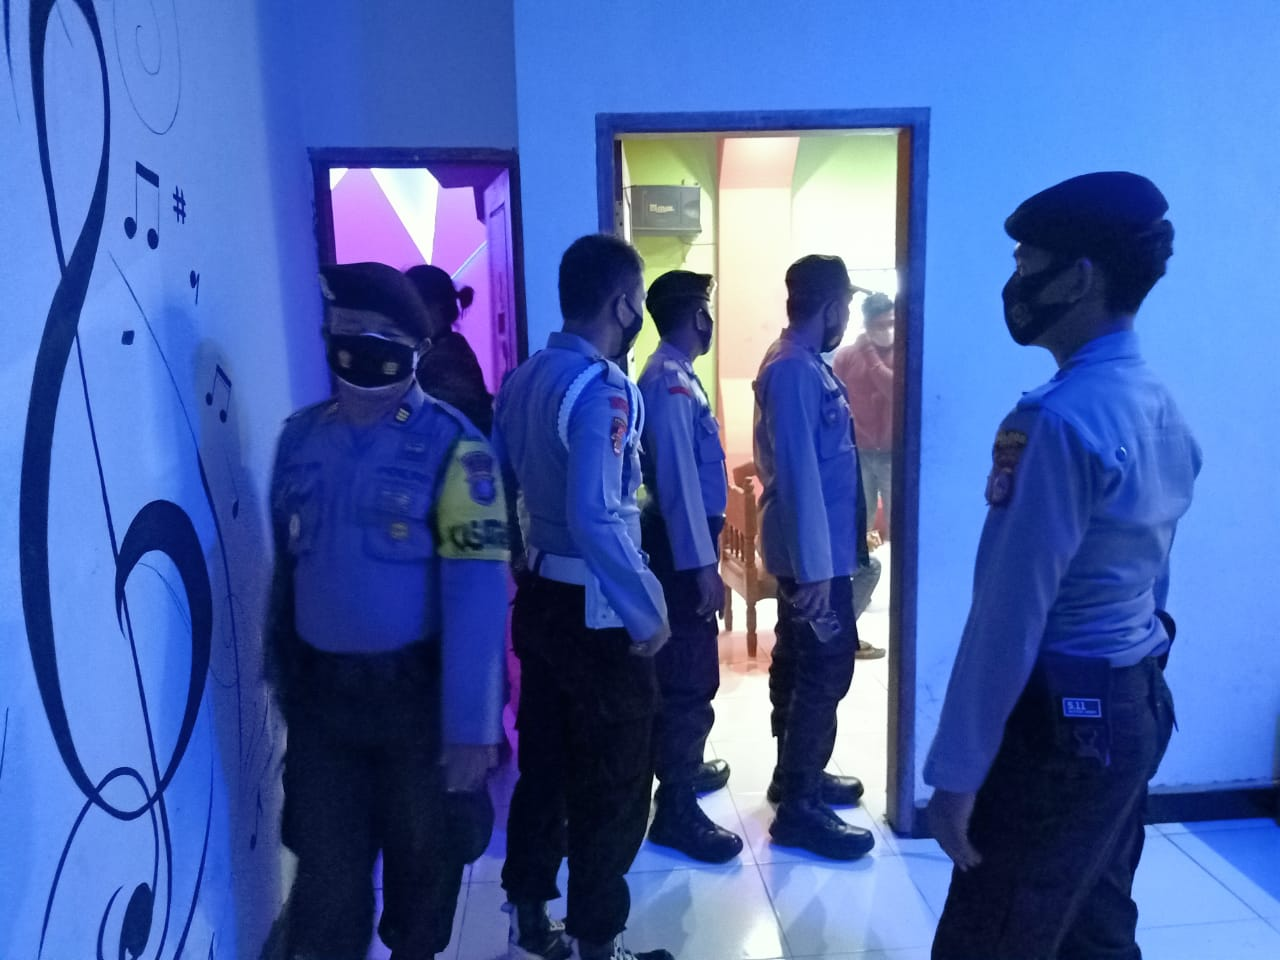 Tingkatkan DisiplinProkes, Personil Polres Buol Gelar KYRD